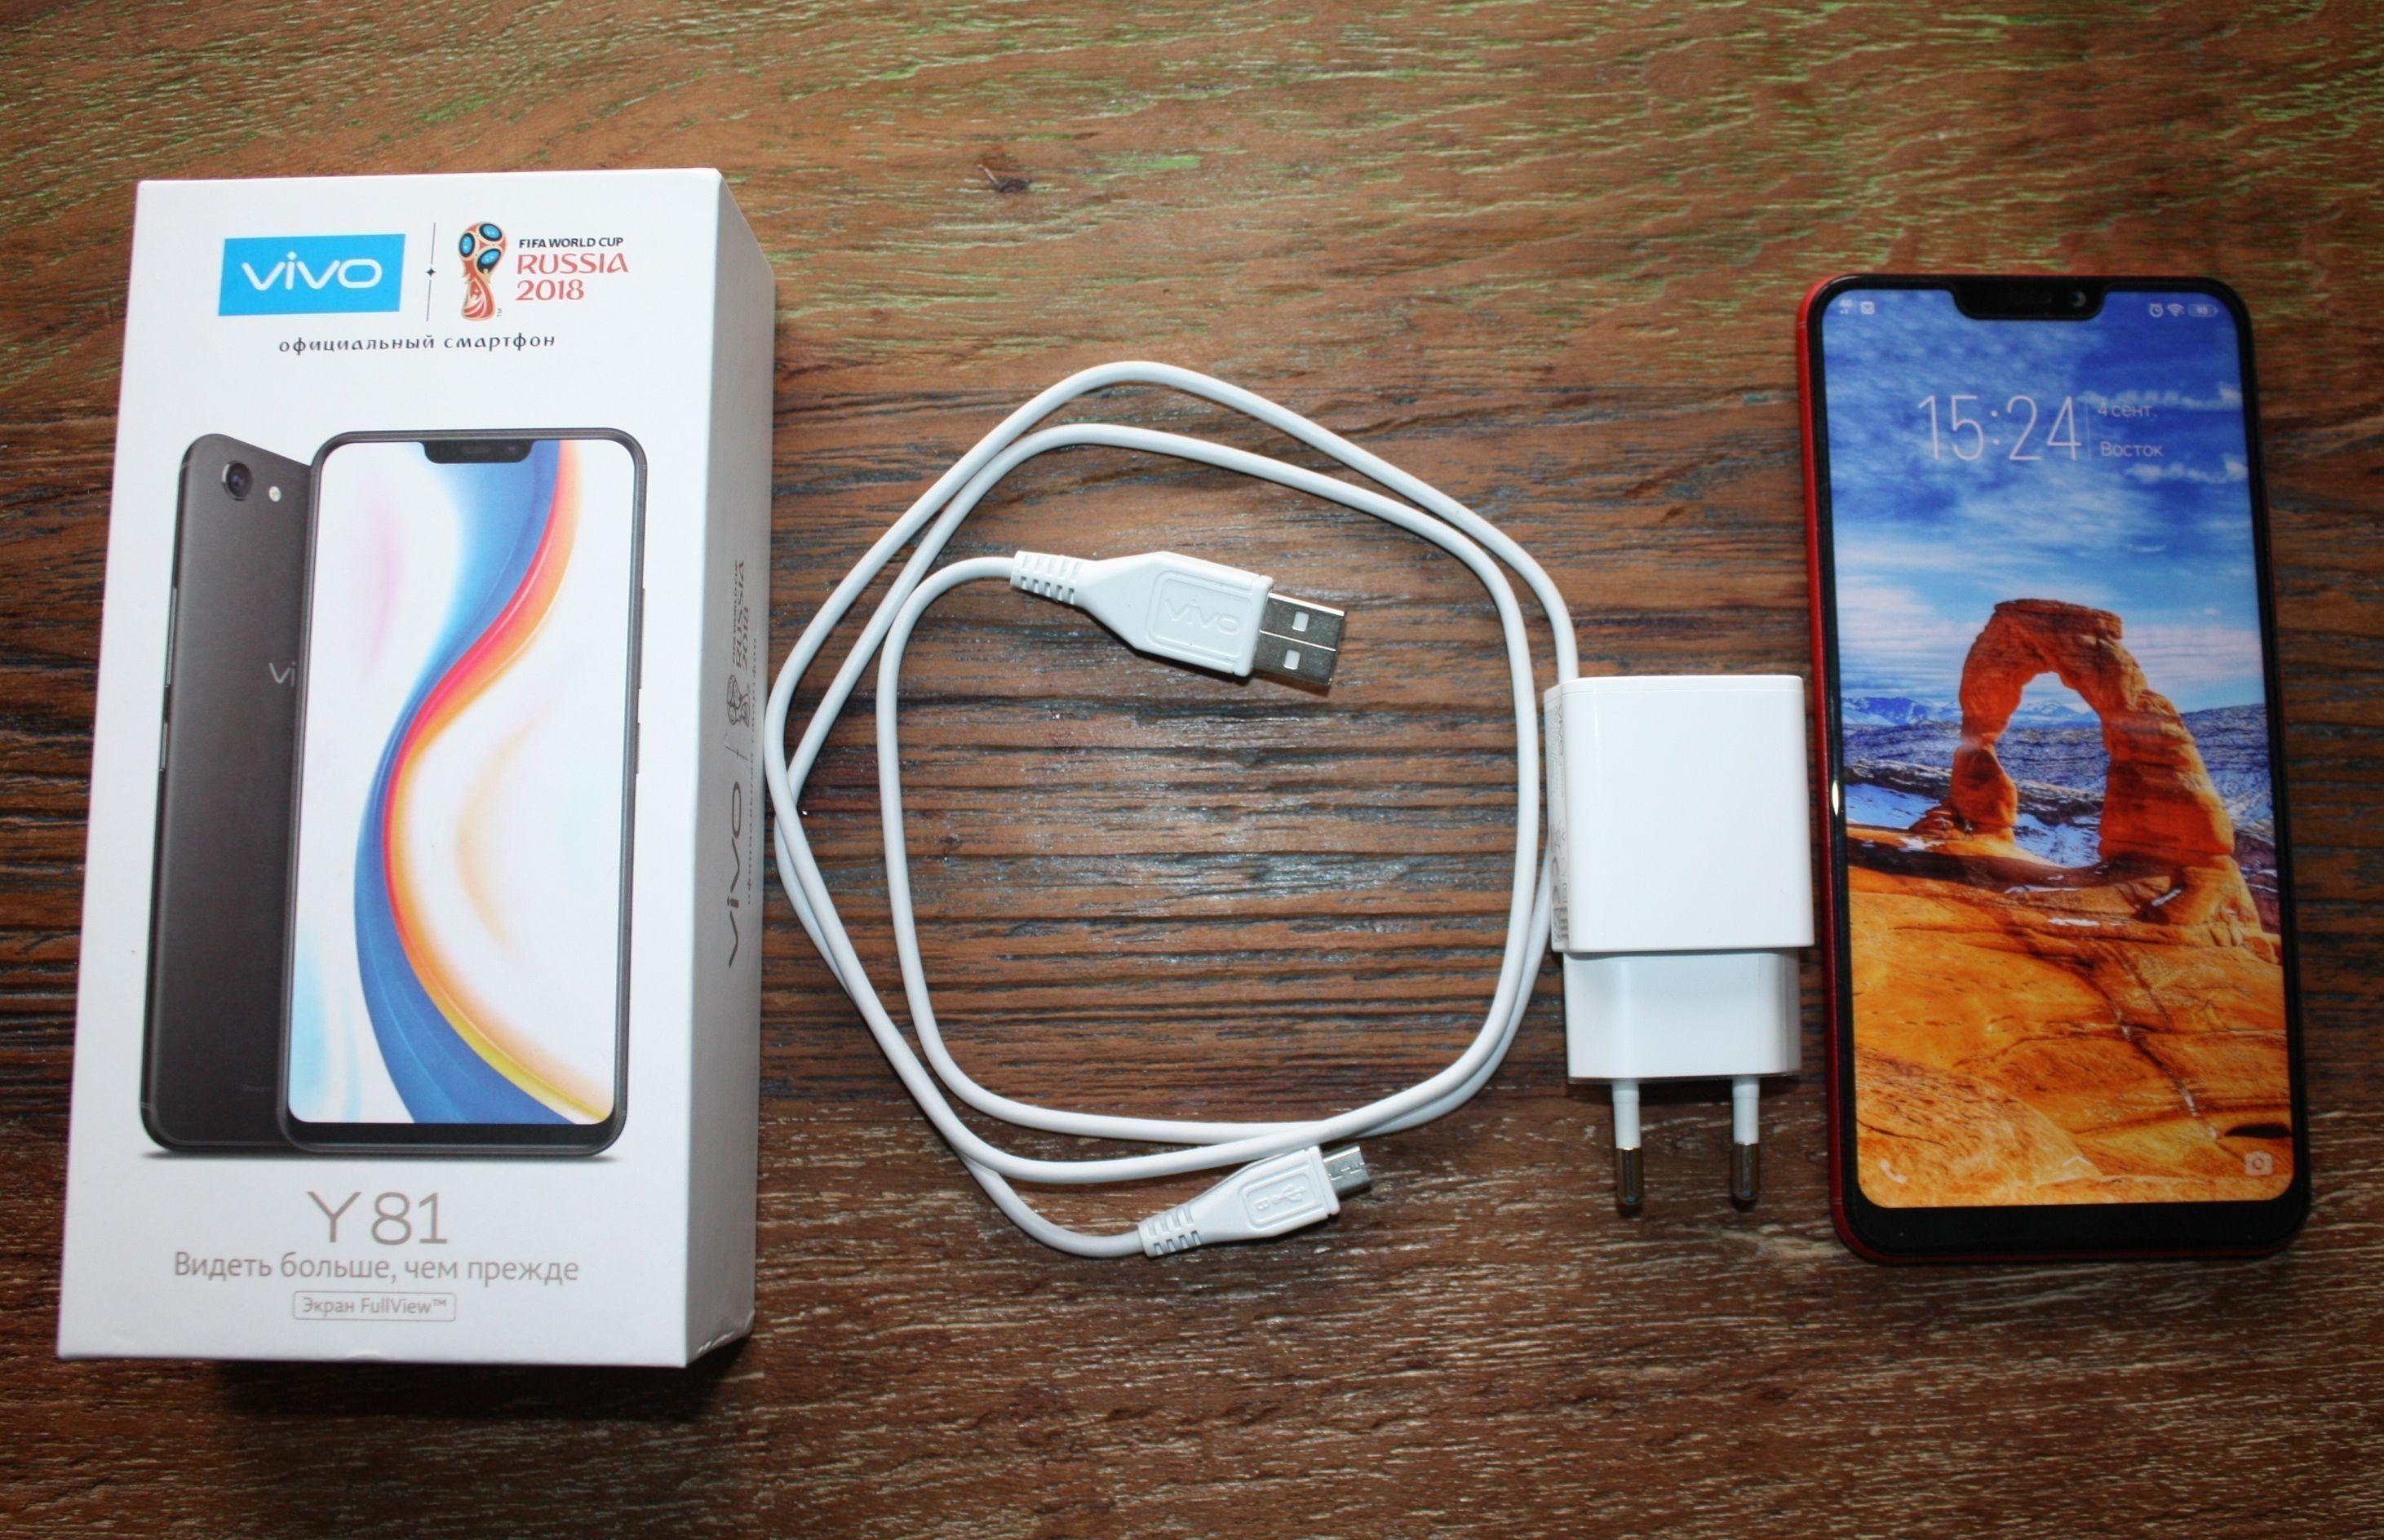 Смартфон Vivo Y81 - предимства и недостатъци